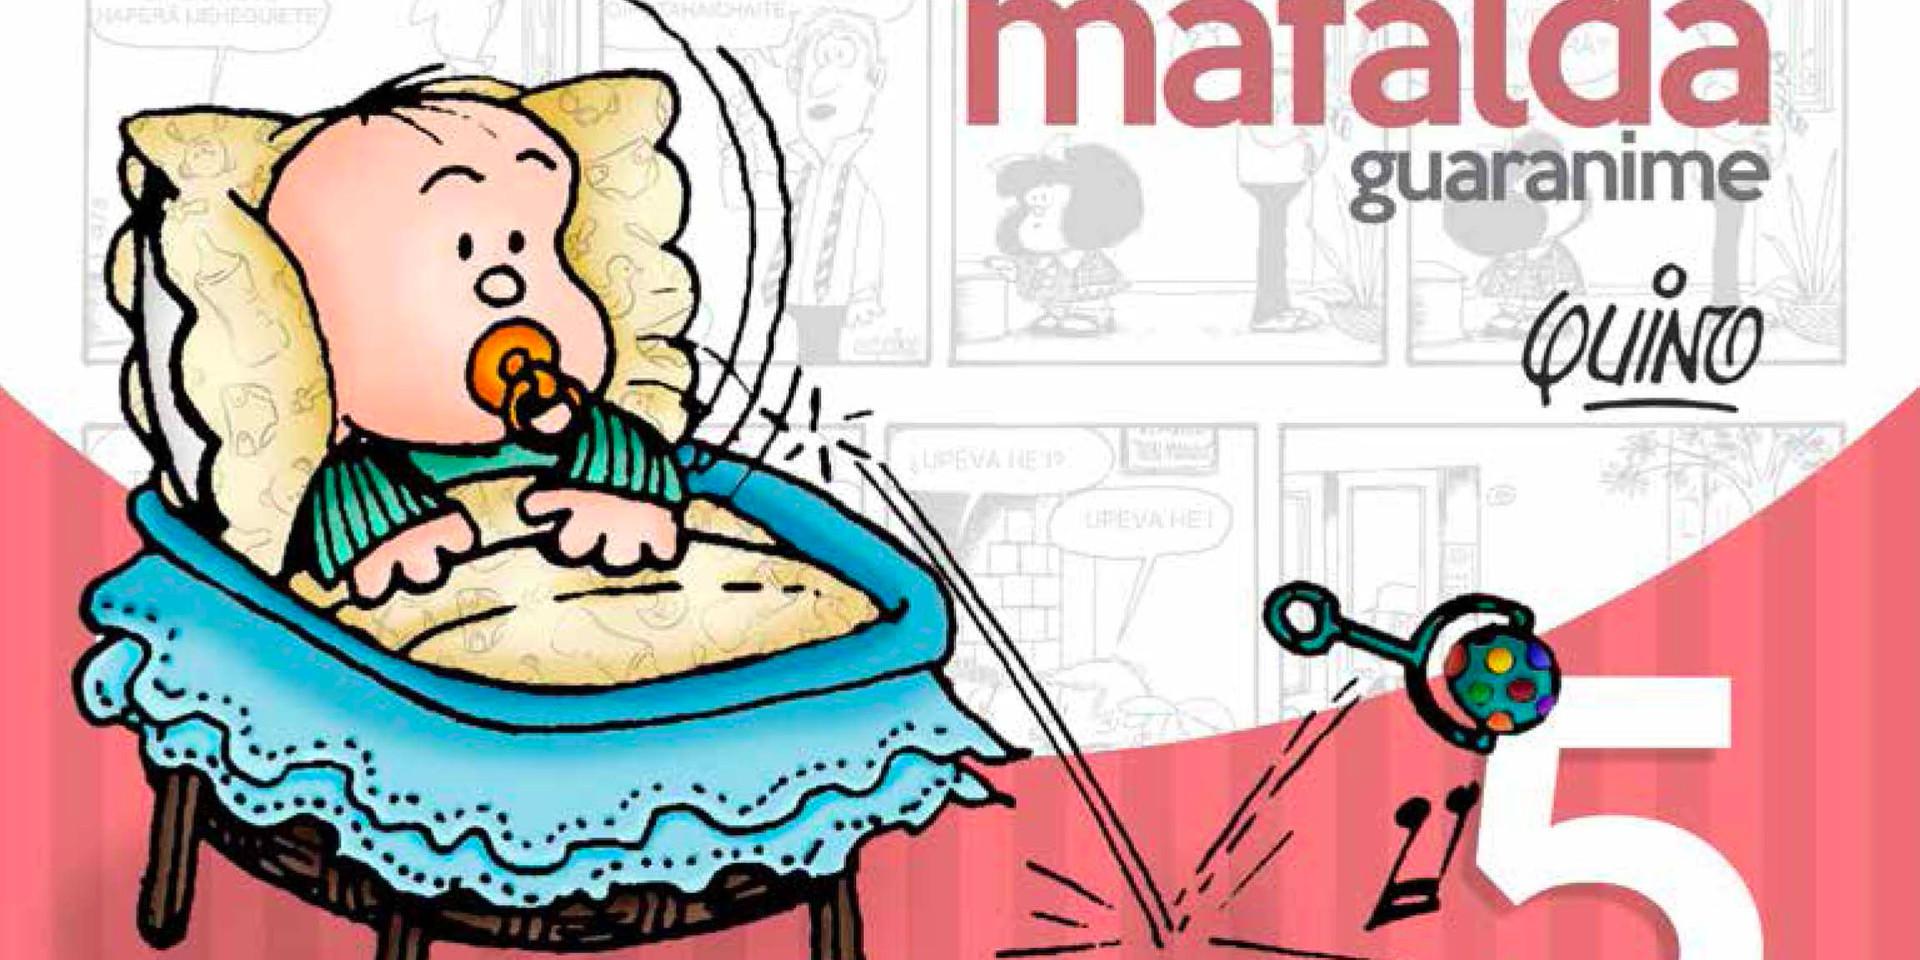 Mafalda_Tomo 5_Final-1.jpg